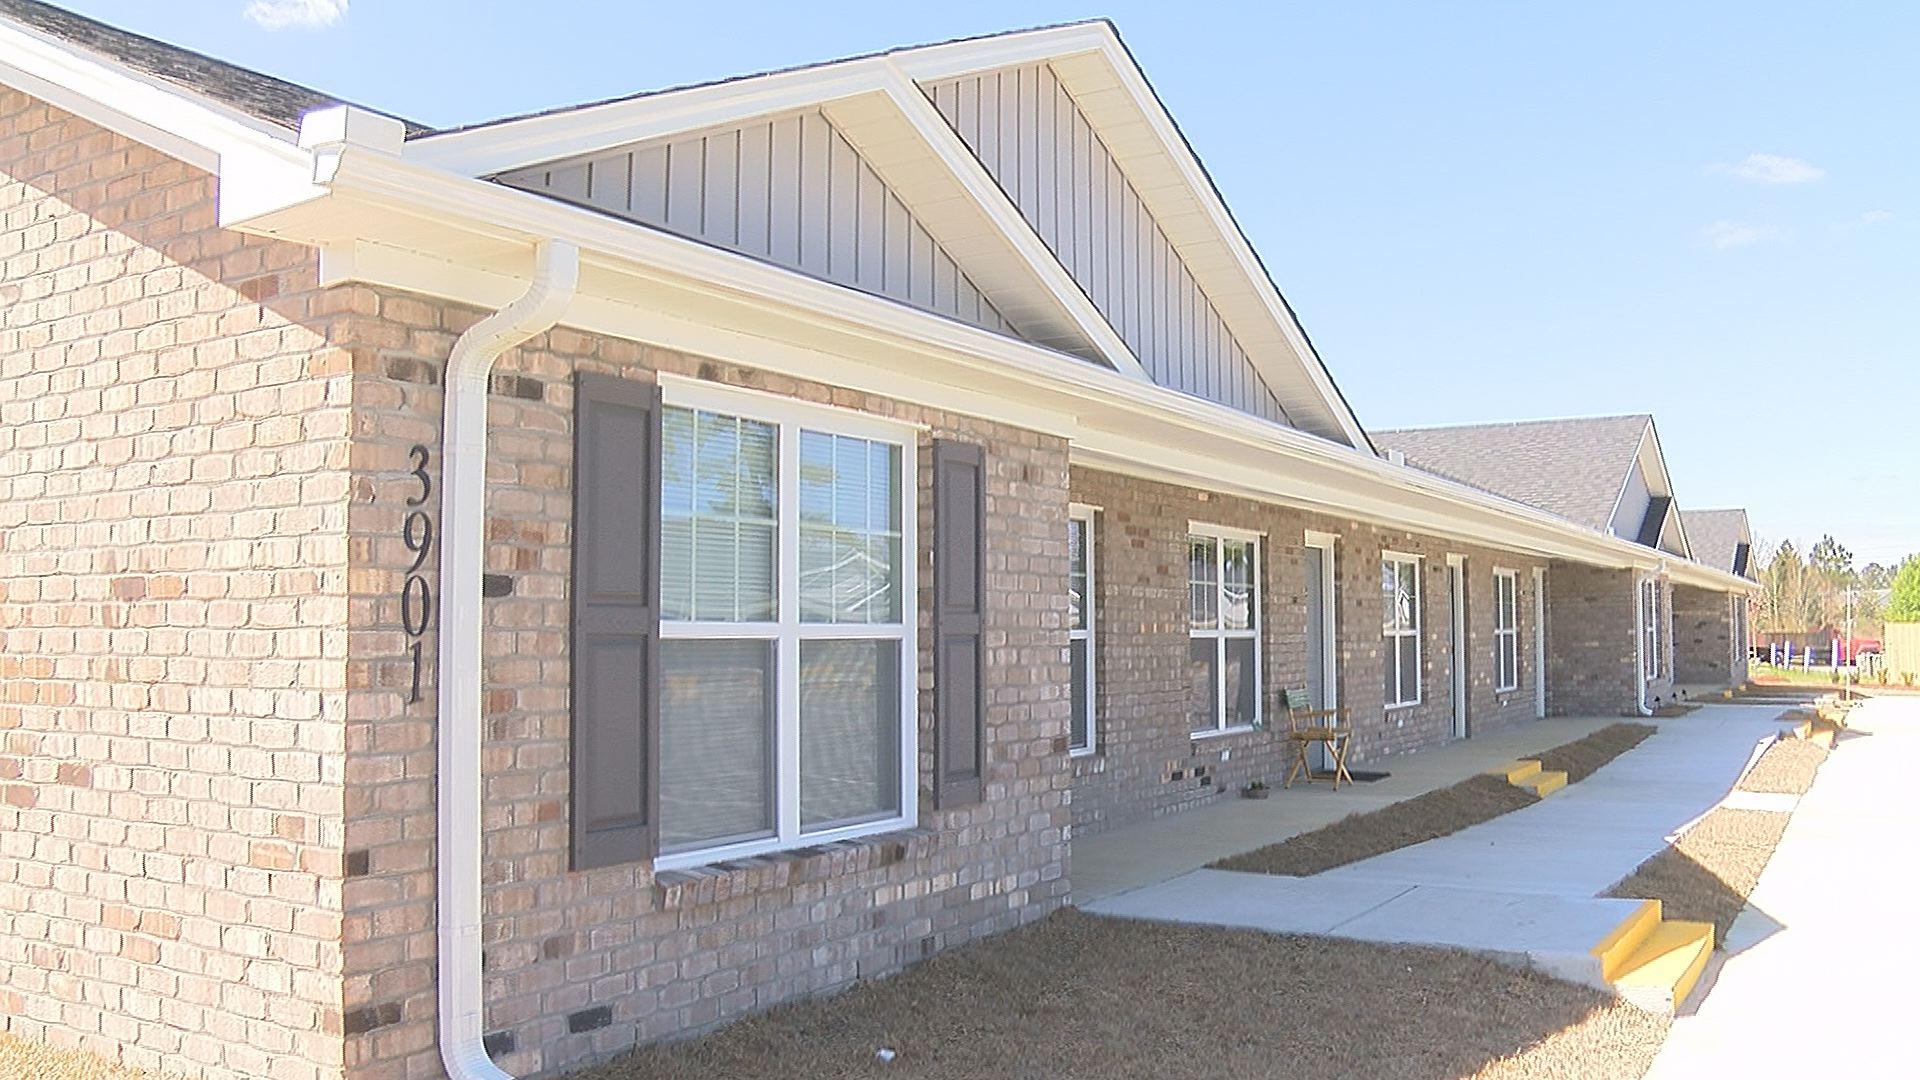 veteran housing_1521755274098.jpg.jpg